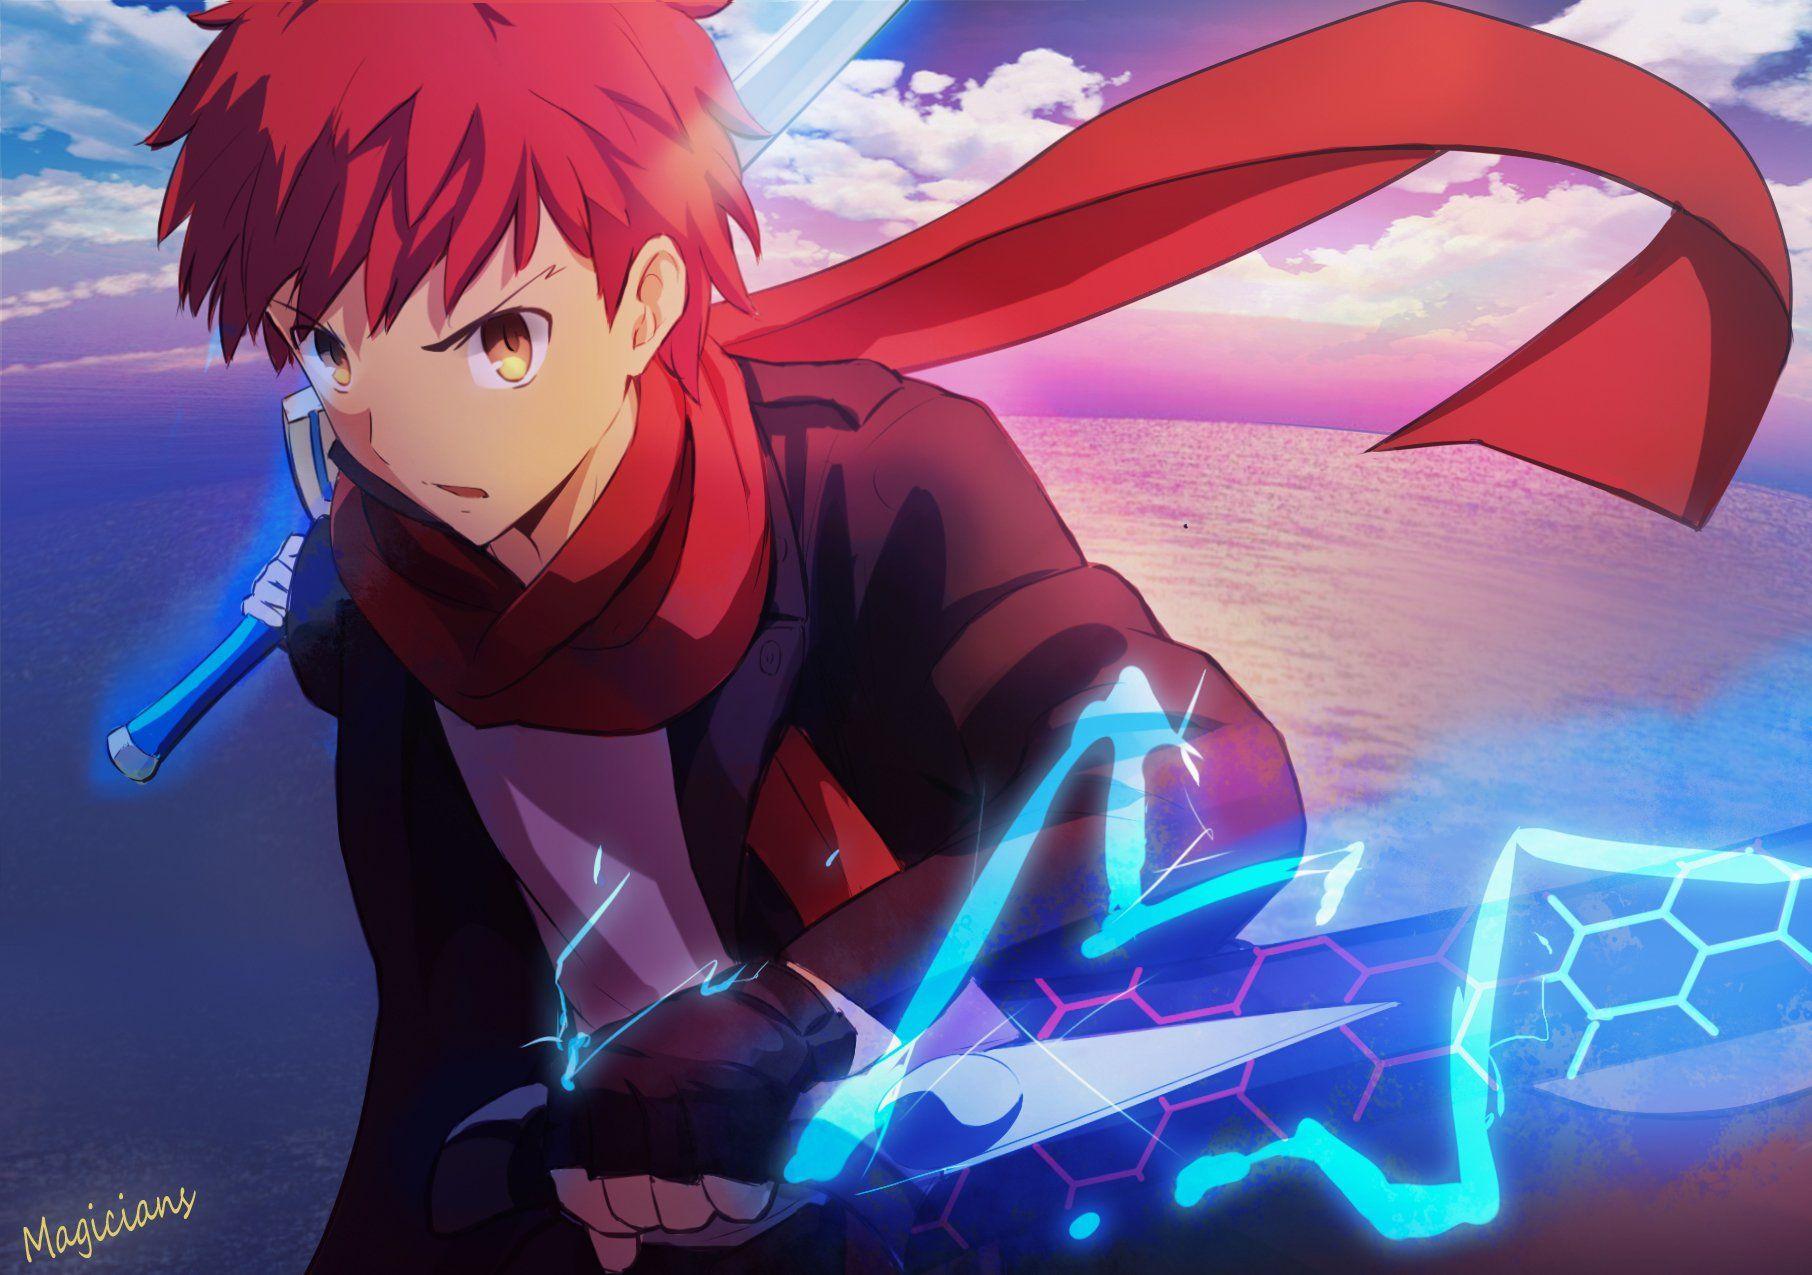 shiro emiya red Shirou emiya, Fate stay night, Anime